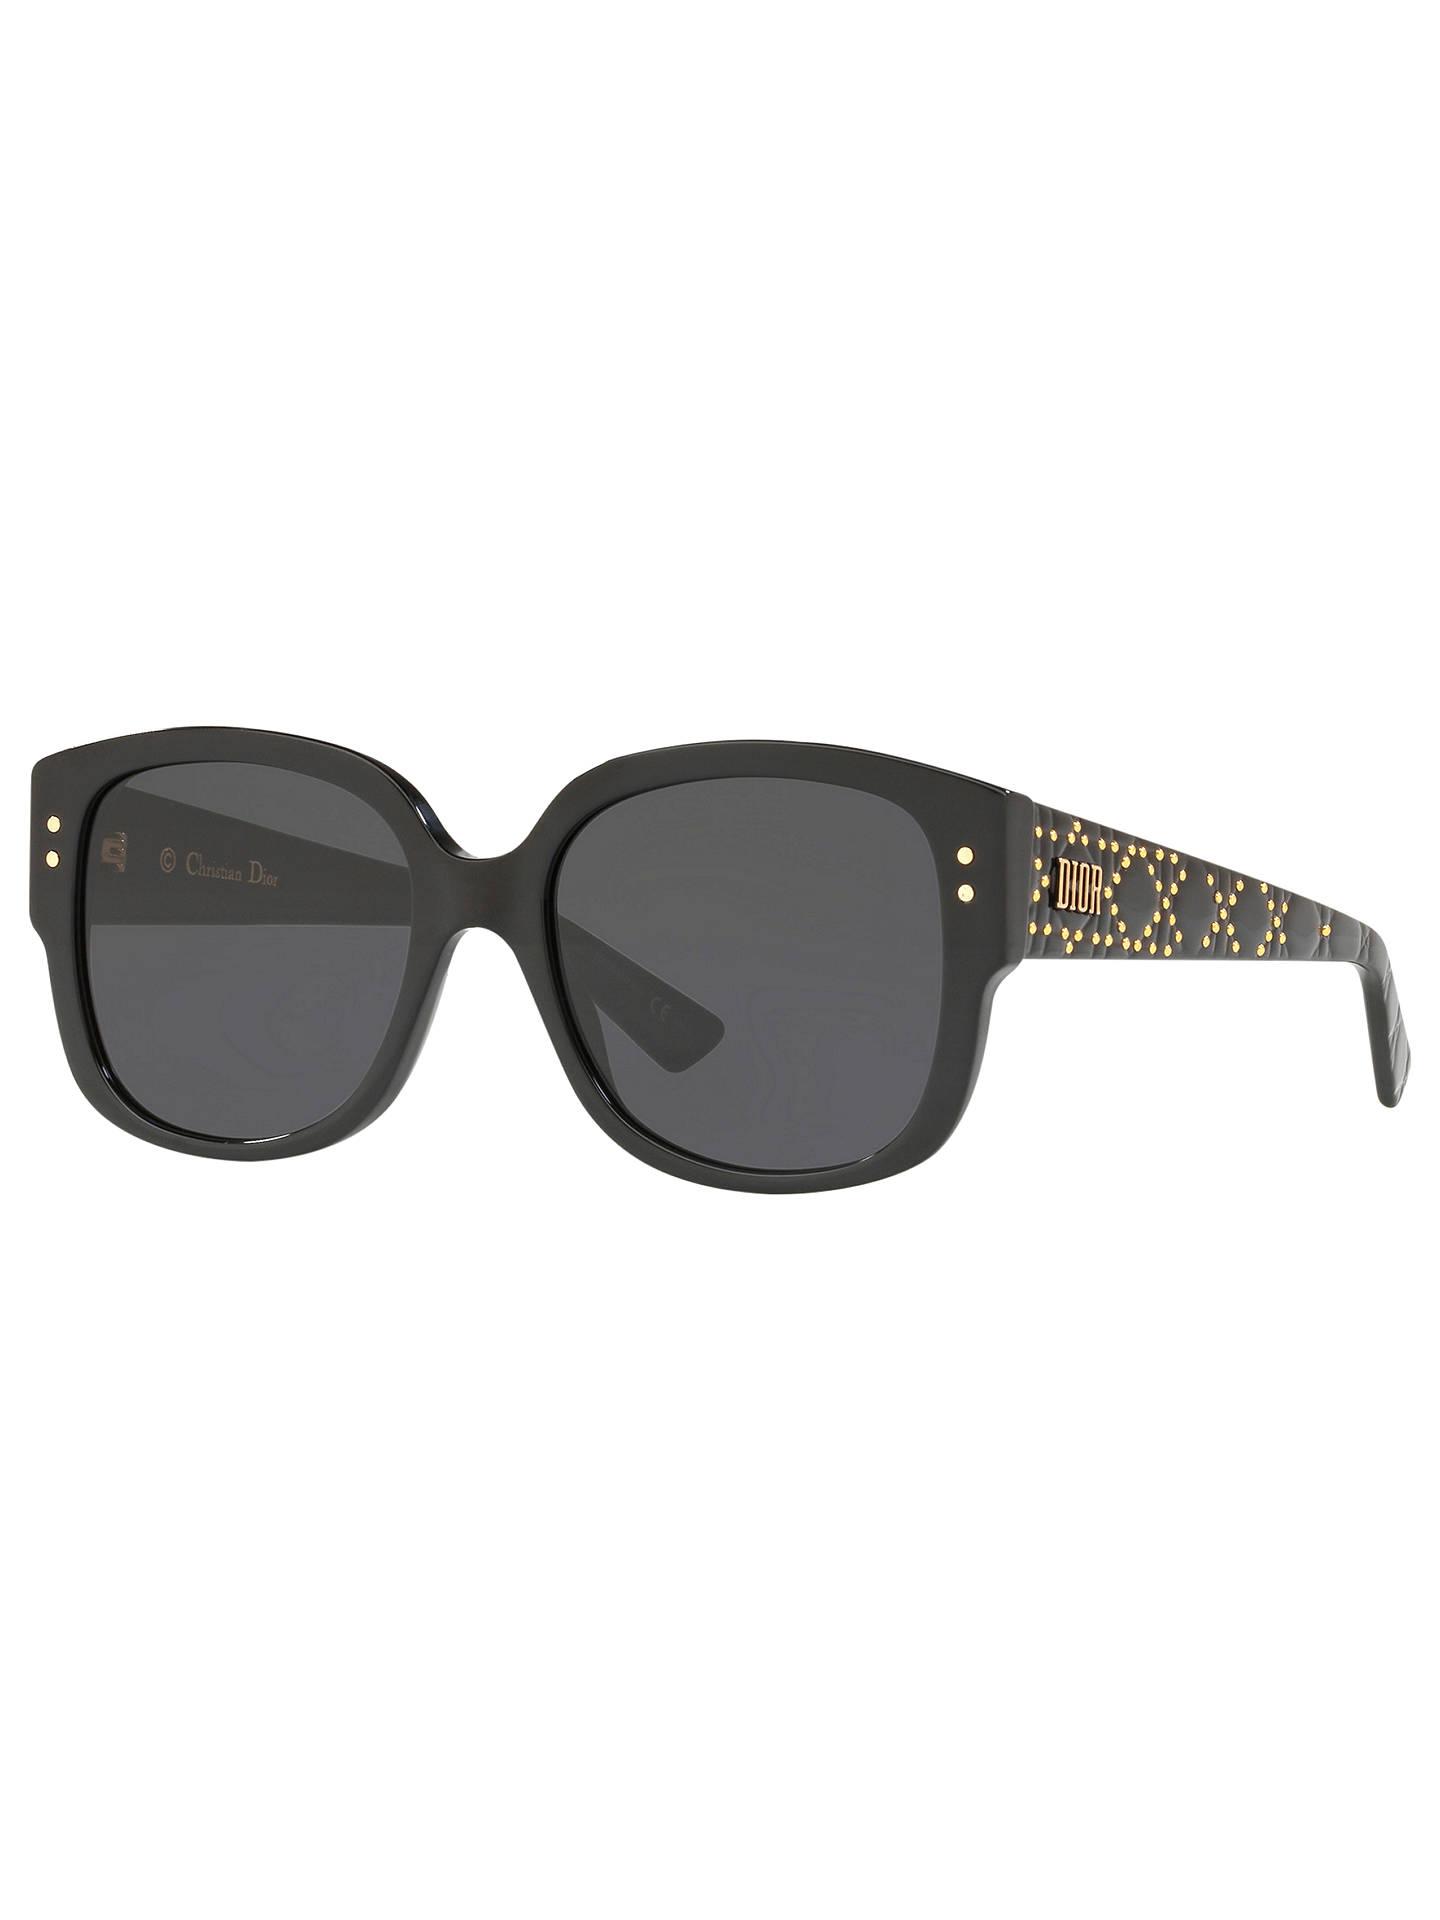 55afb8b45e Dior LadyDiorStuds Cat s Eye Sunglasses at John Lewis   Partners